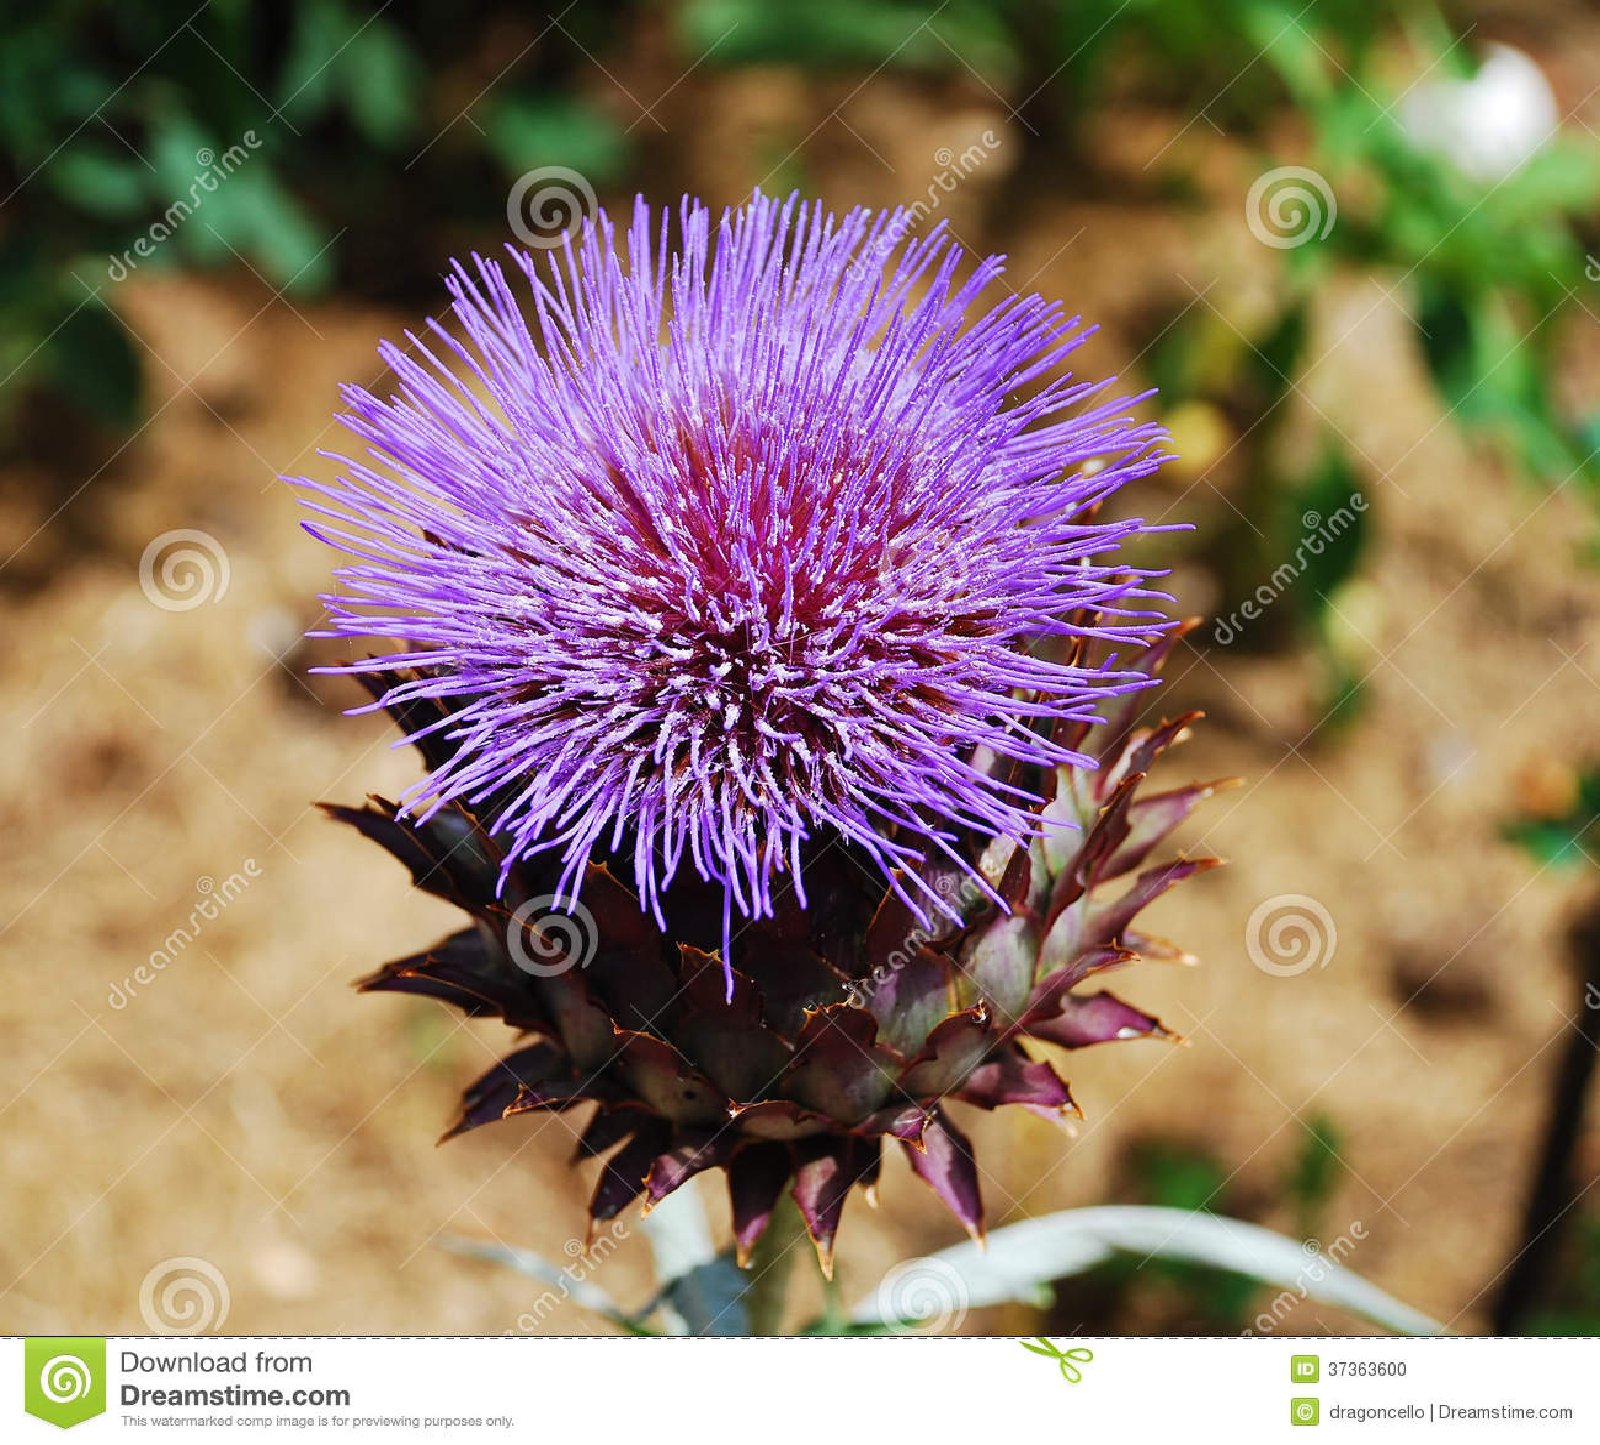 Giant Thistle Flower Stock Photo Image Of Large Plant 37363600